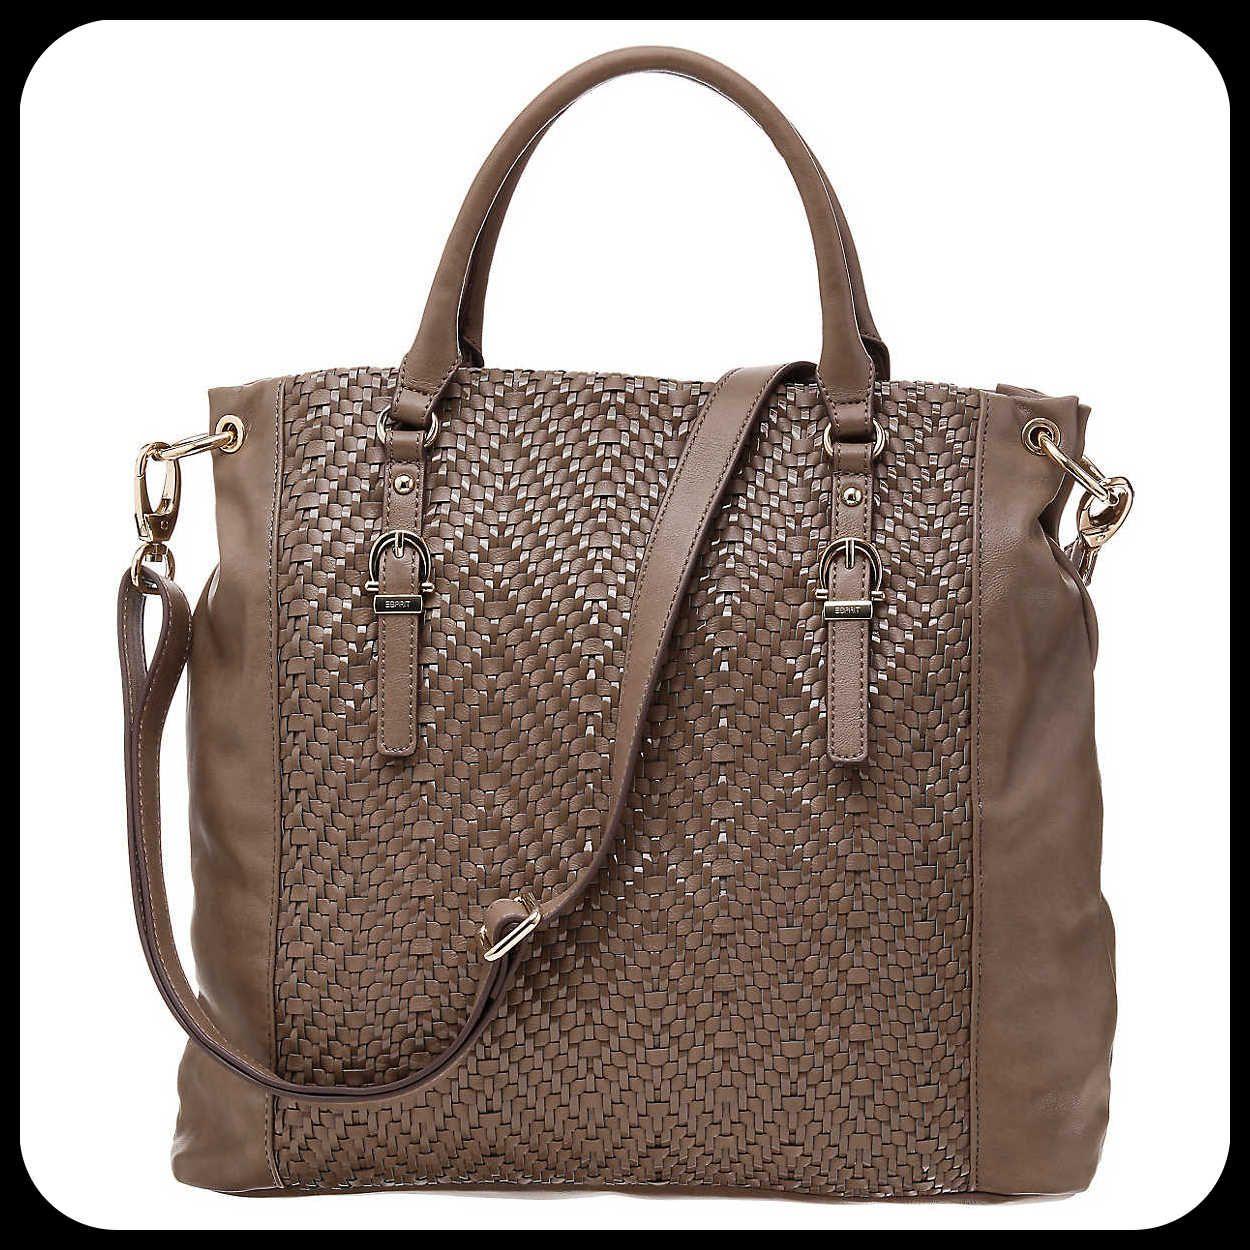 d2701202b14 Esprit Karla Handtasche   BAG. LADY   Pinterest   Taschen, Bag and ...